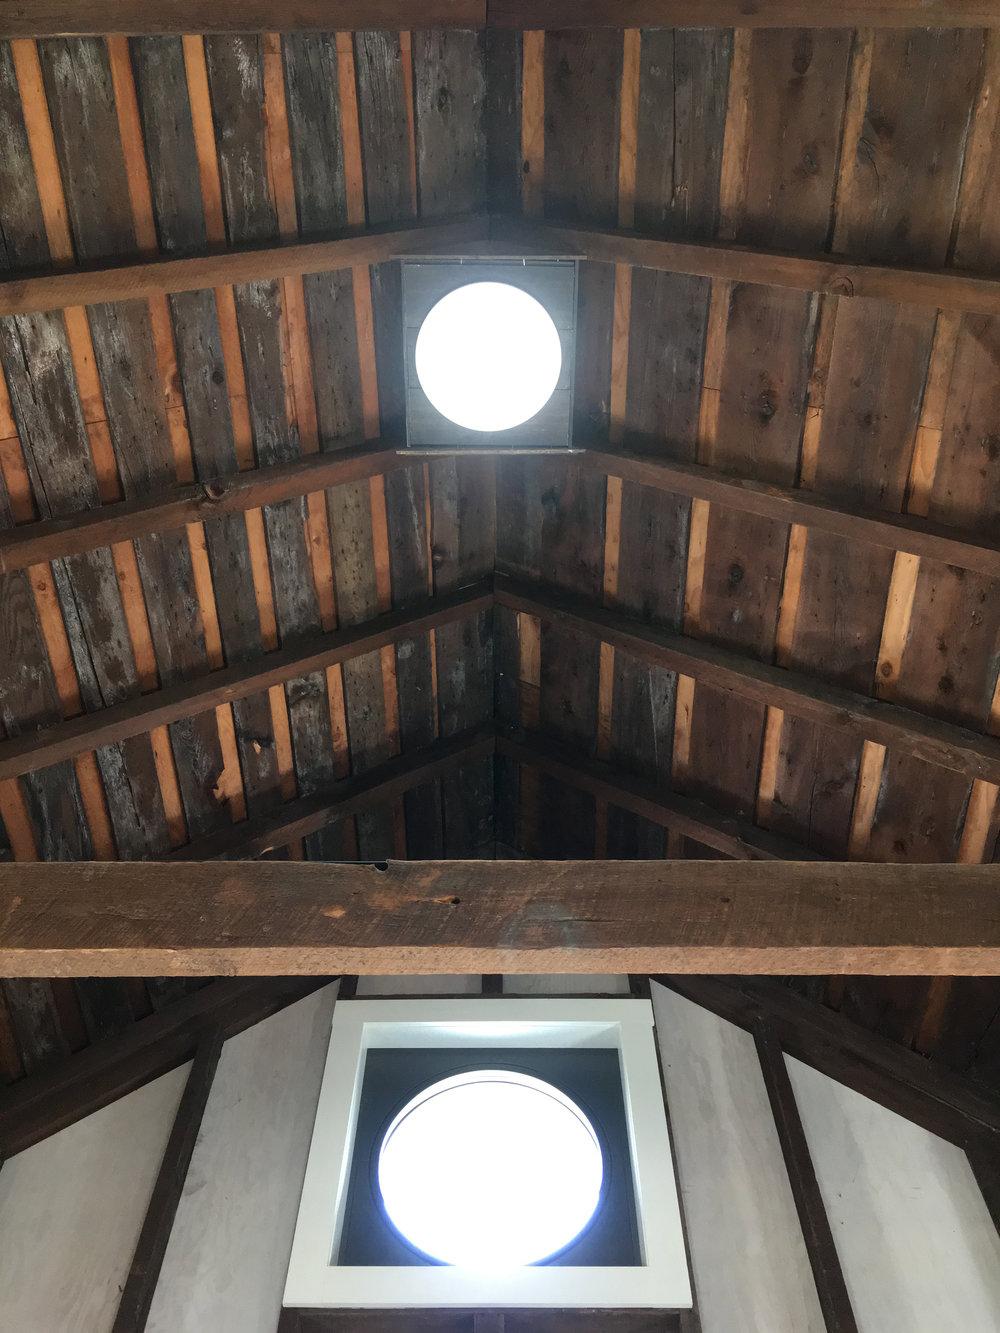 08_178 Main Street_Interior - Ceiling.JPG